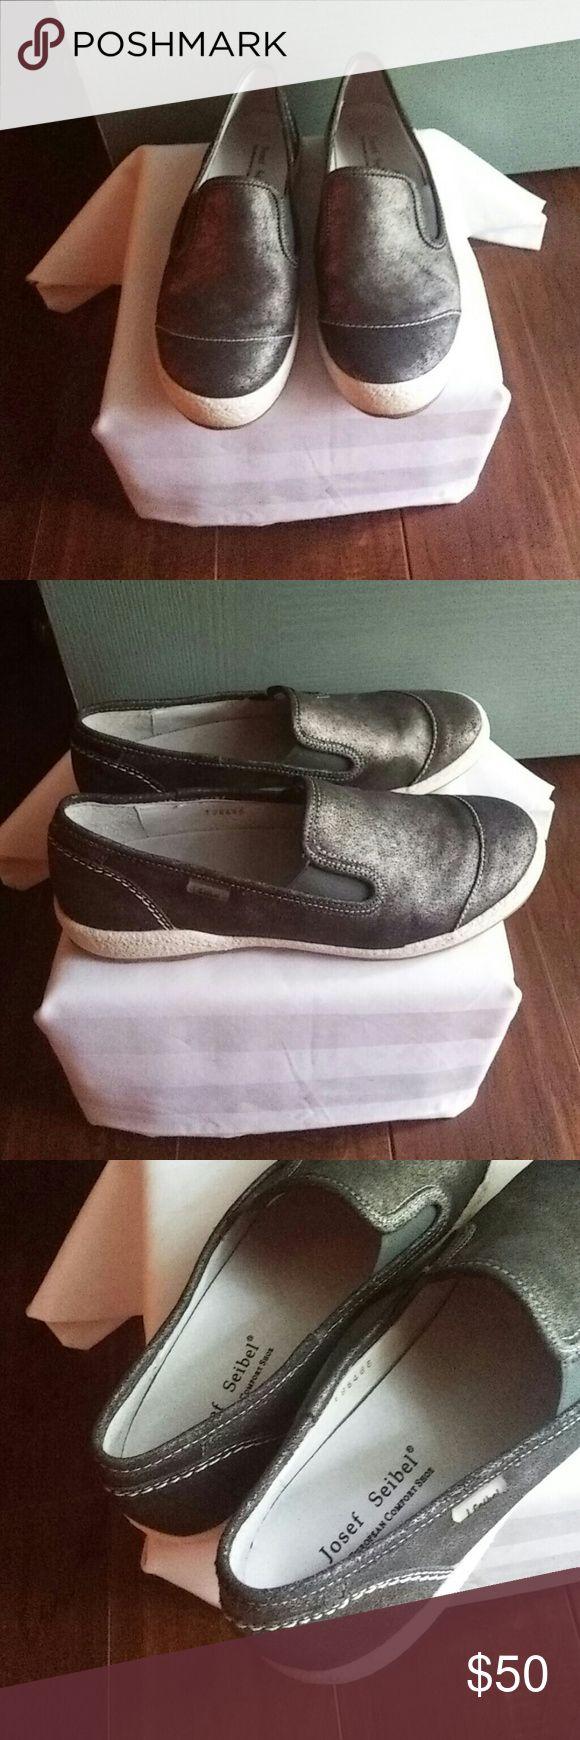 Josef Seibel Caspian comfort shoe Slip on European comfort shoe. Graphite color, very good condition Josef Seibel Shoes Flats & Loafers